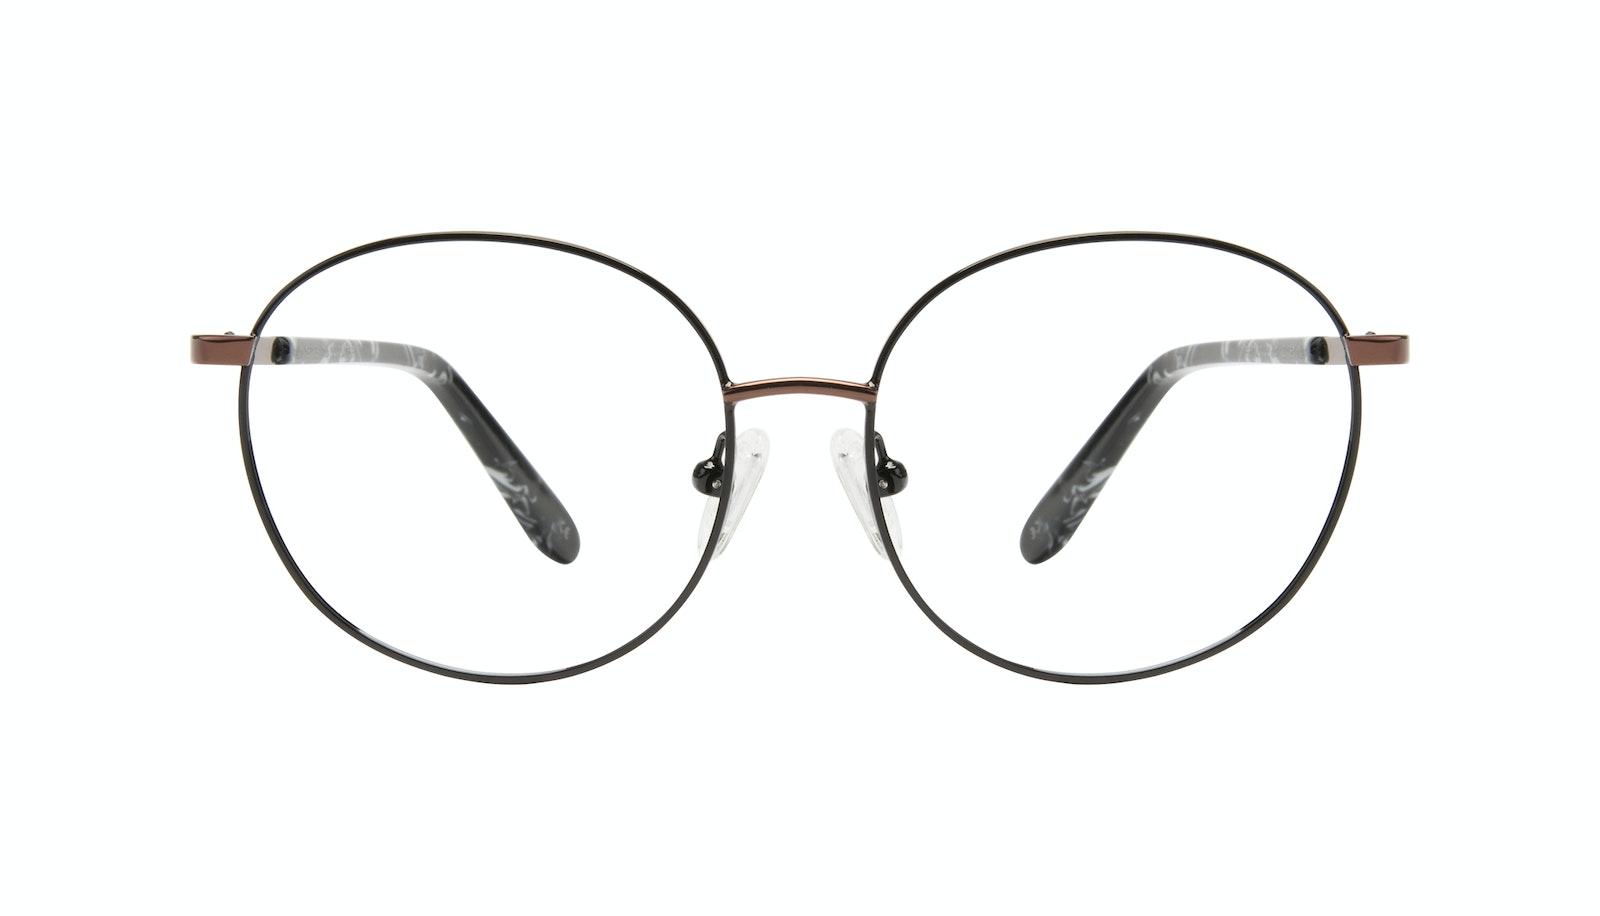 Affordable Fashion Glasses Round Eyeglasses Women Joy Petite Black Copper